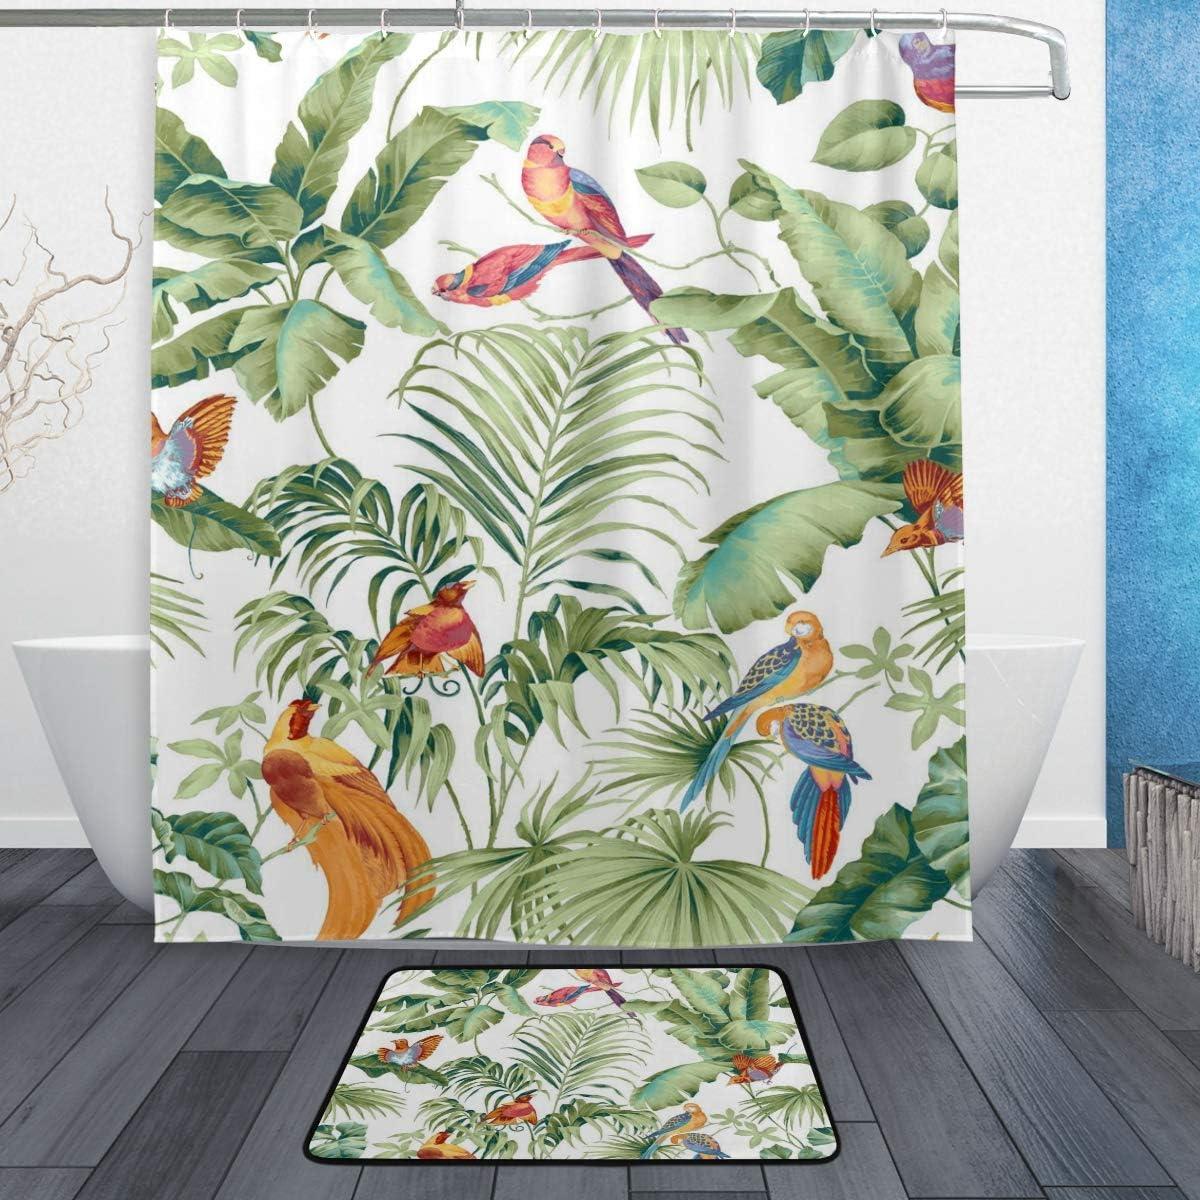 Amazon.com: LORVIES Jungle Canopy Spring Bathroom Set, Polyester